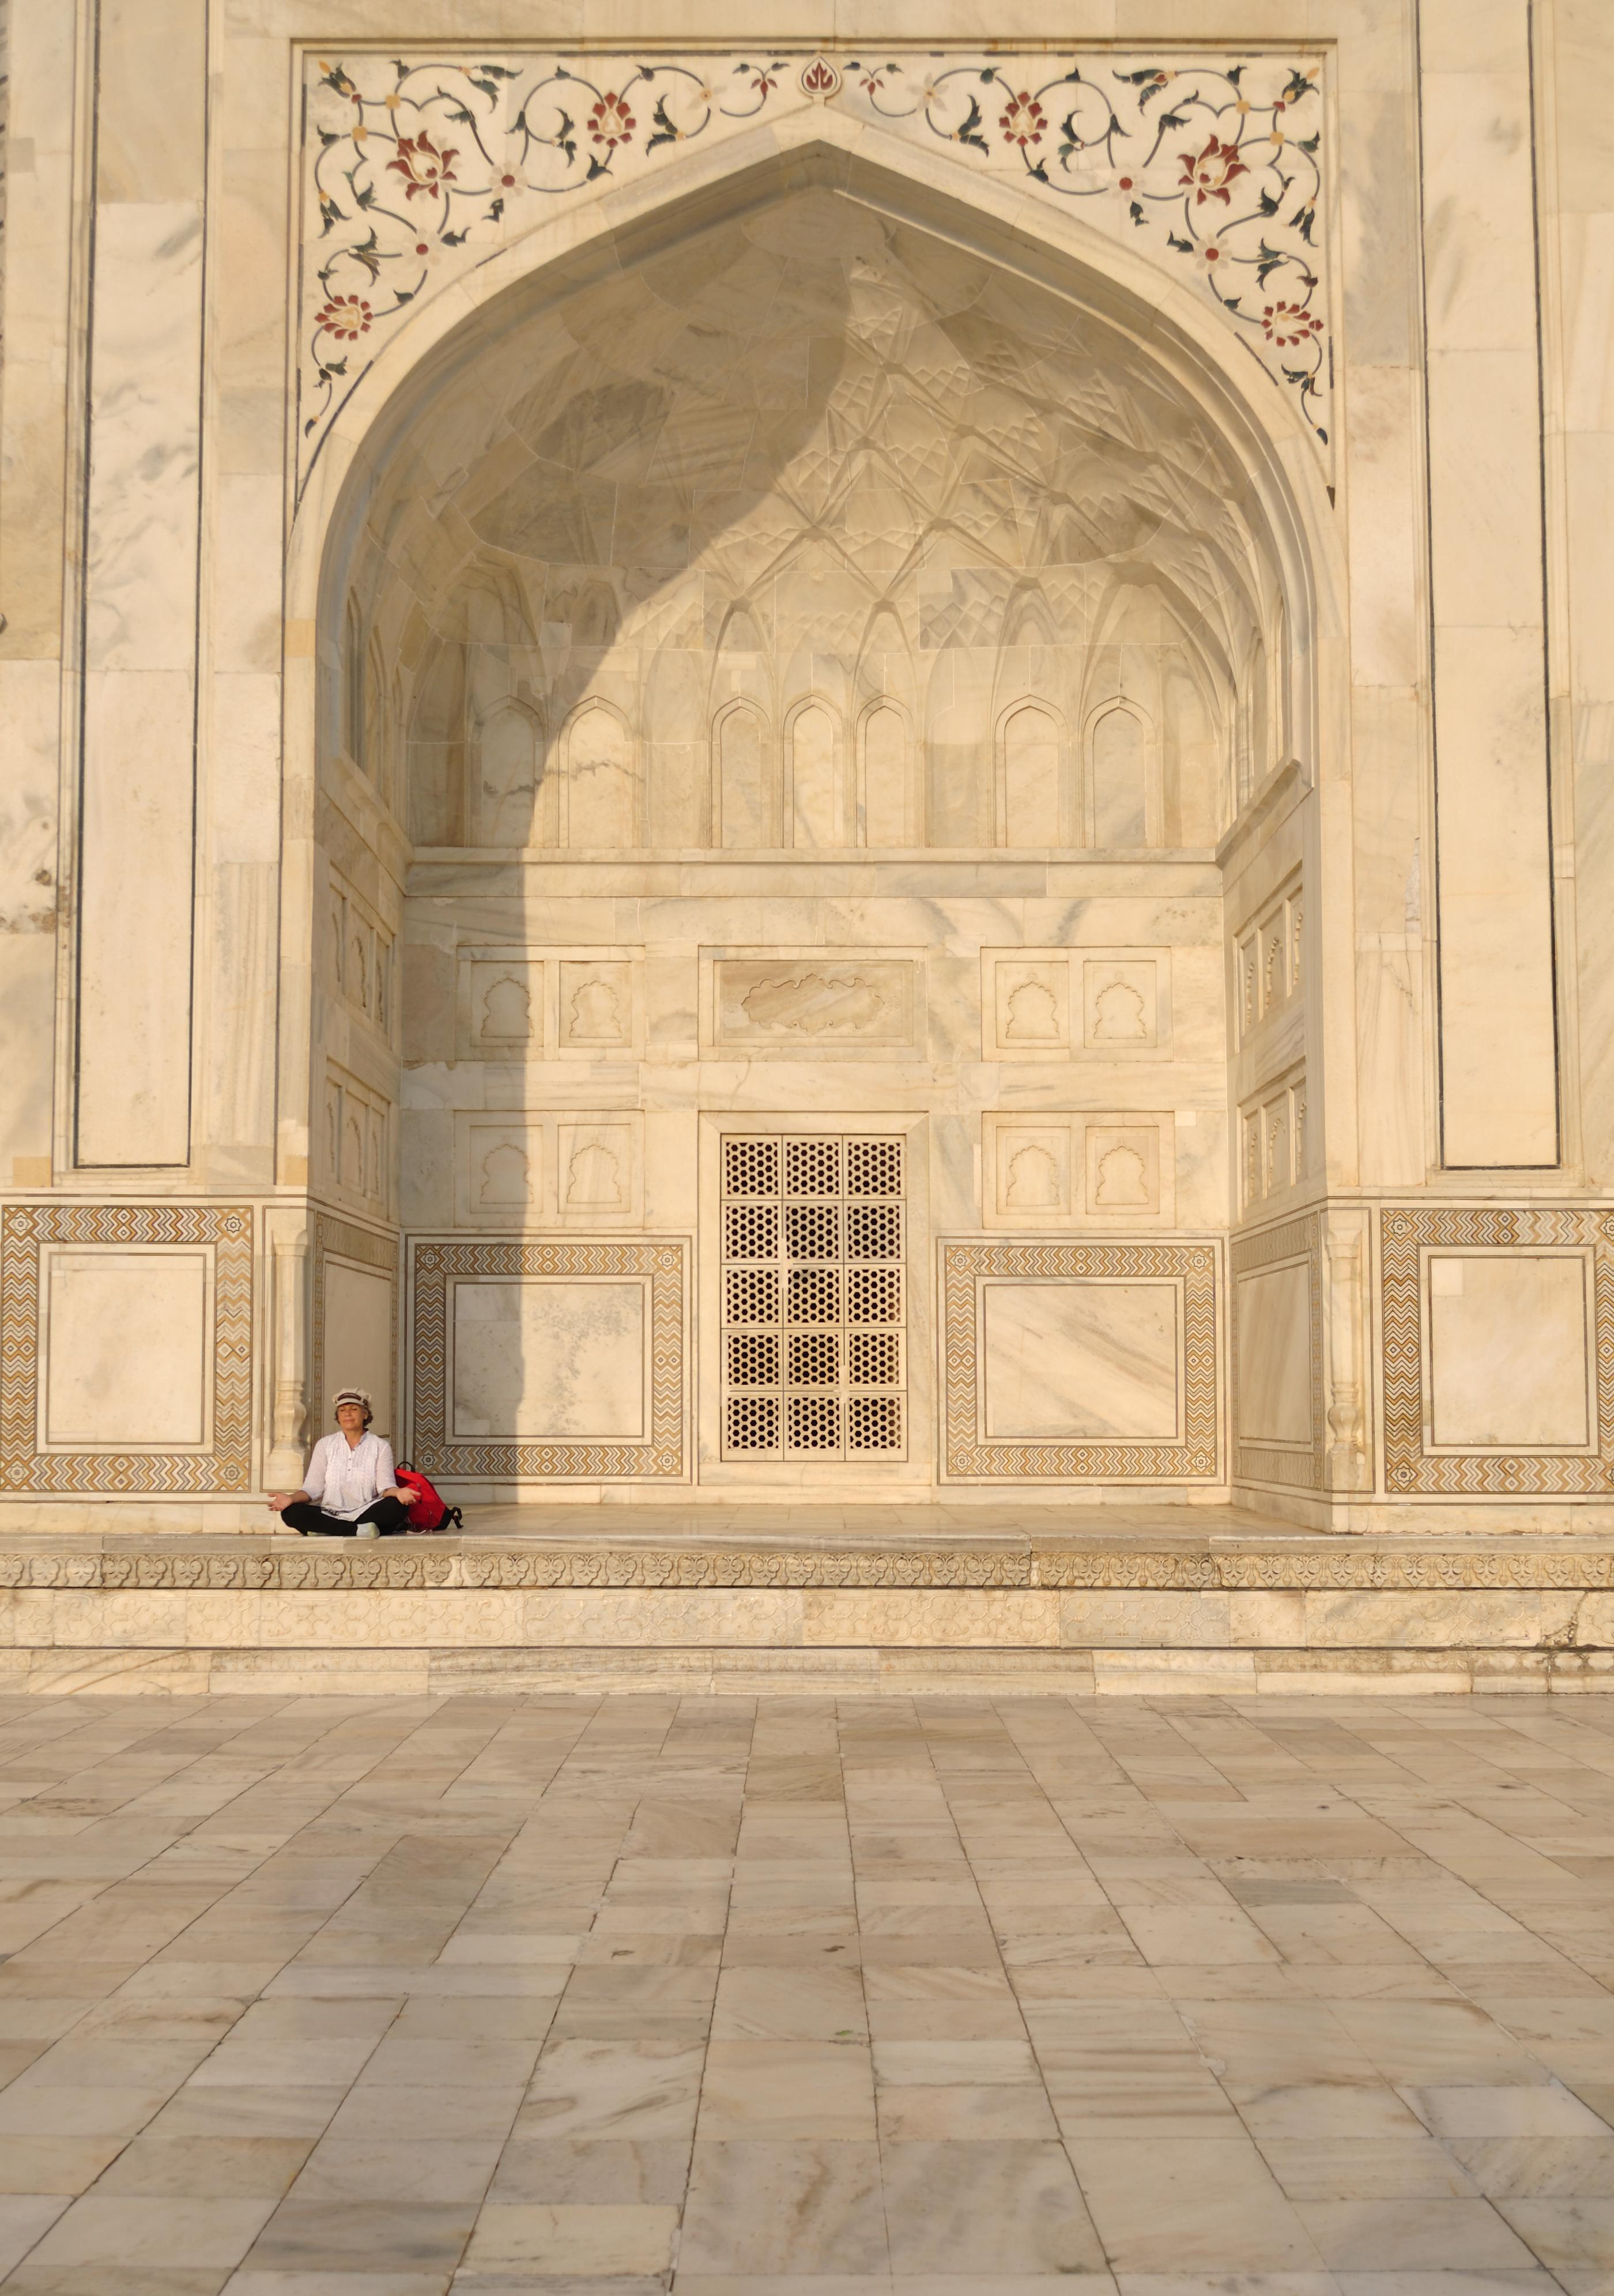 File:Section of Taj Mahal -Original Version.jpg - Wikimedia Commons